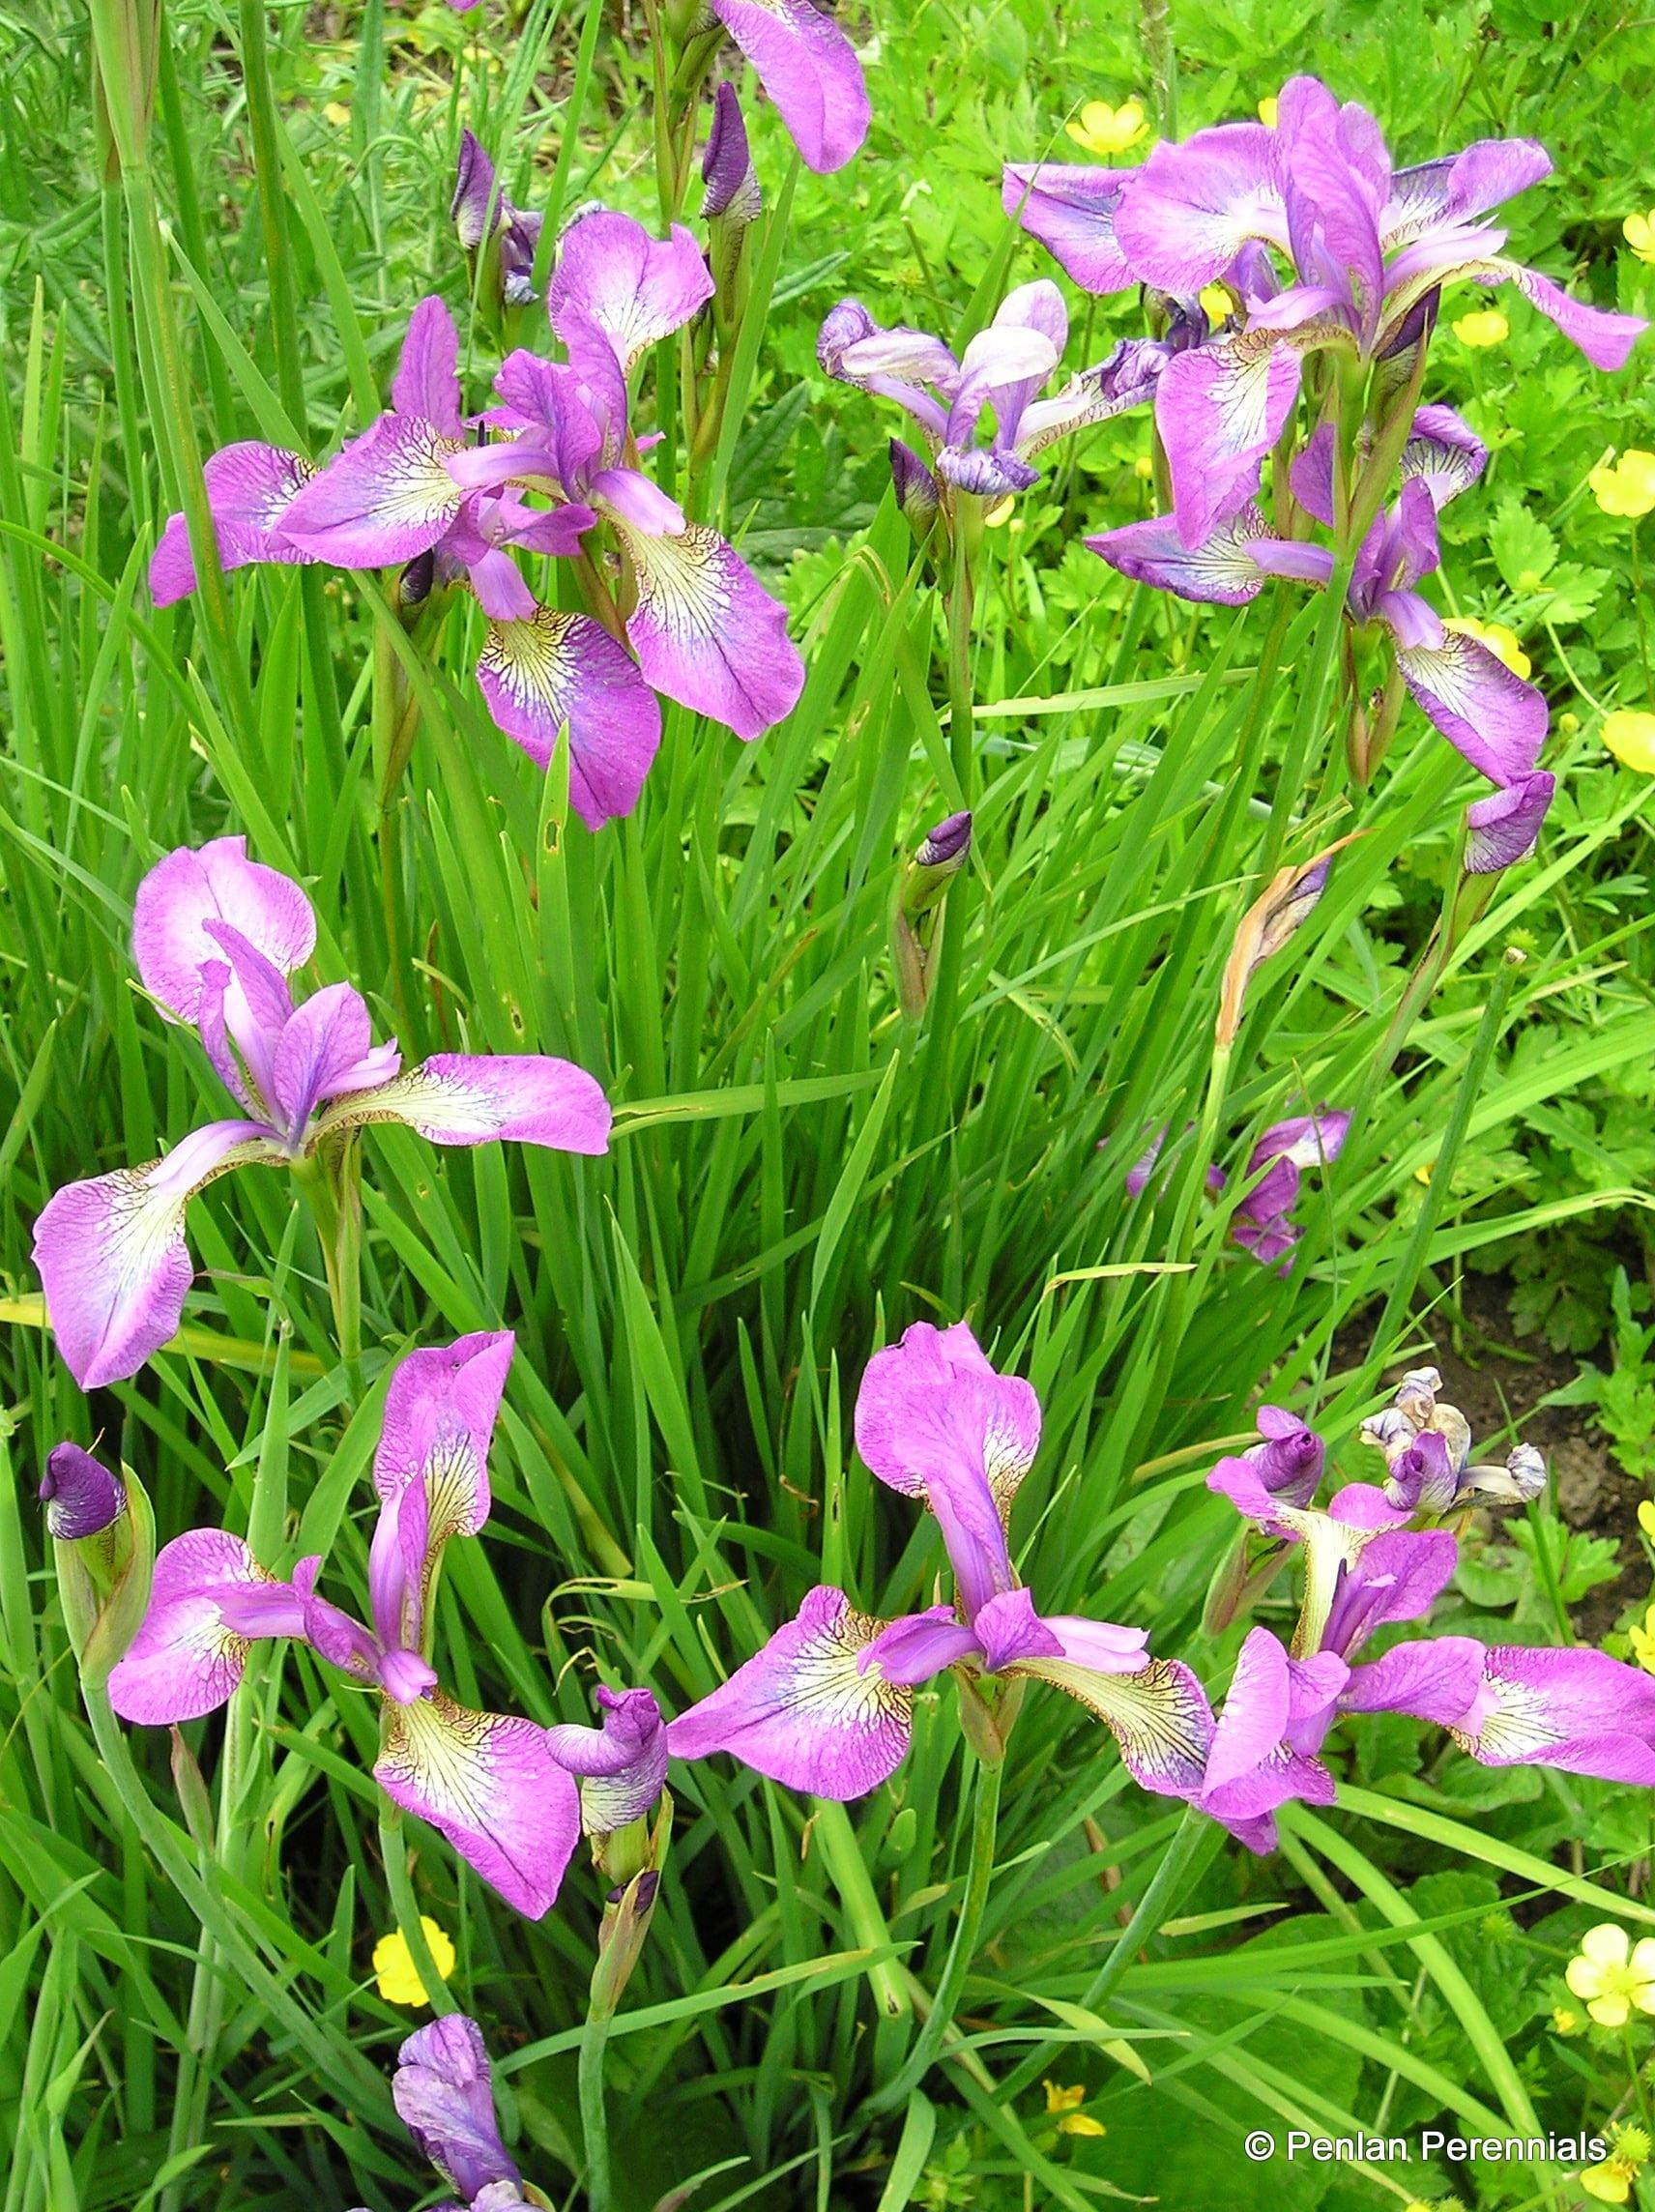 Penlan Perennials Nursery: Iris Sibirica 'Sparkling Rosé'